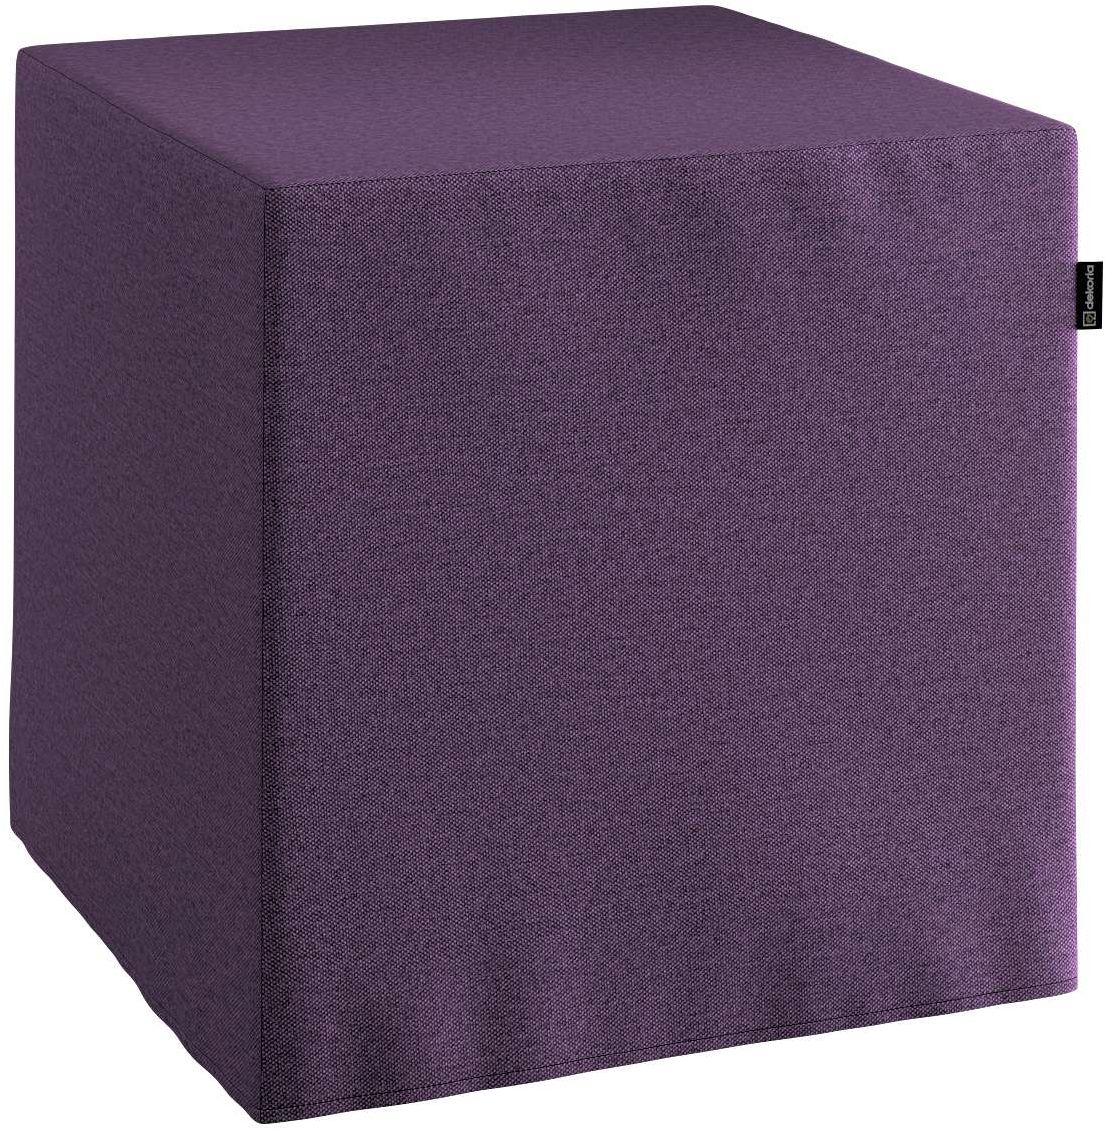 Pufa kostka, fioletowy, 40  40  40 cm, Etna